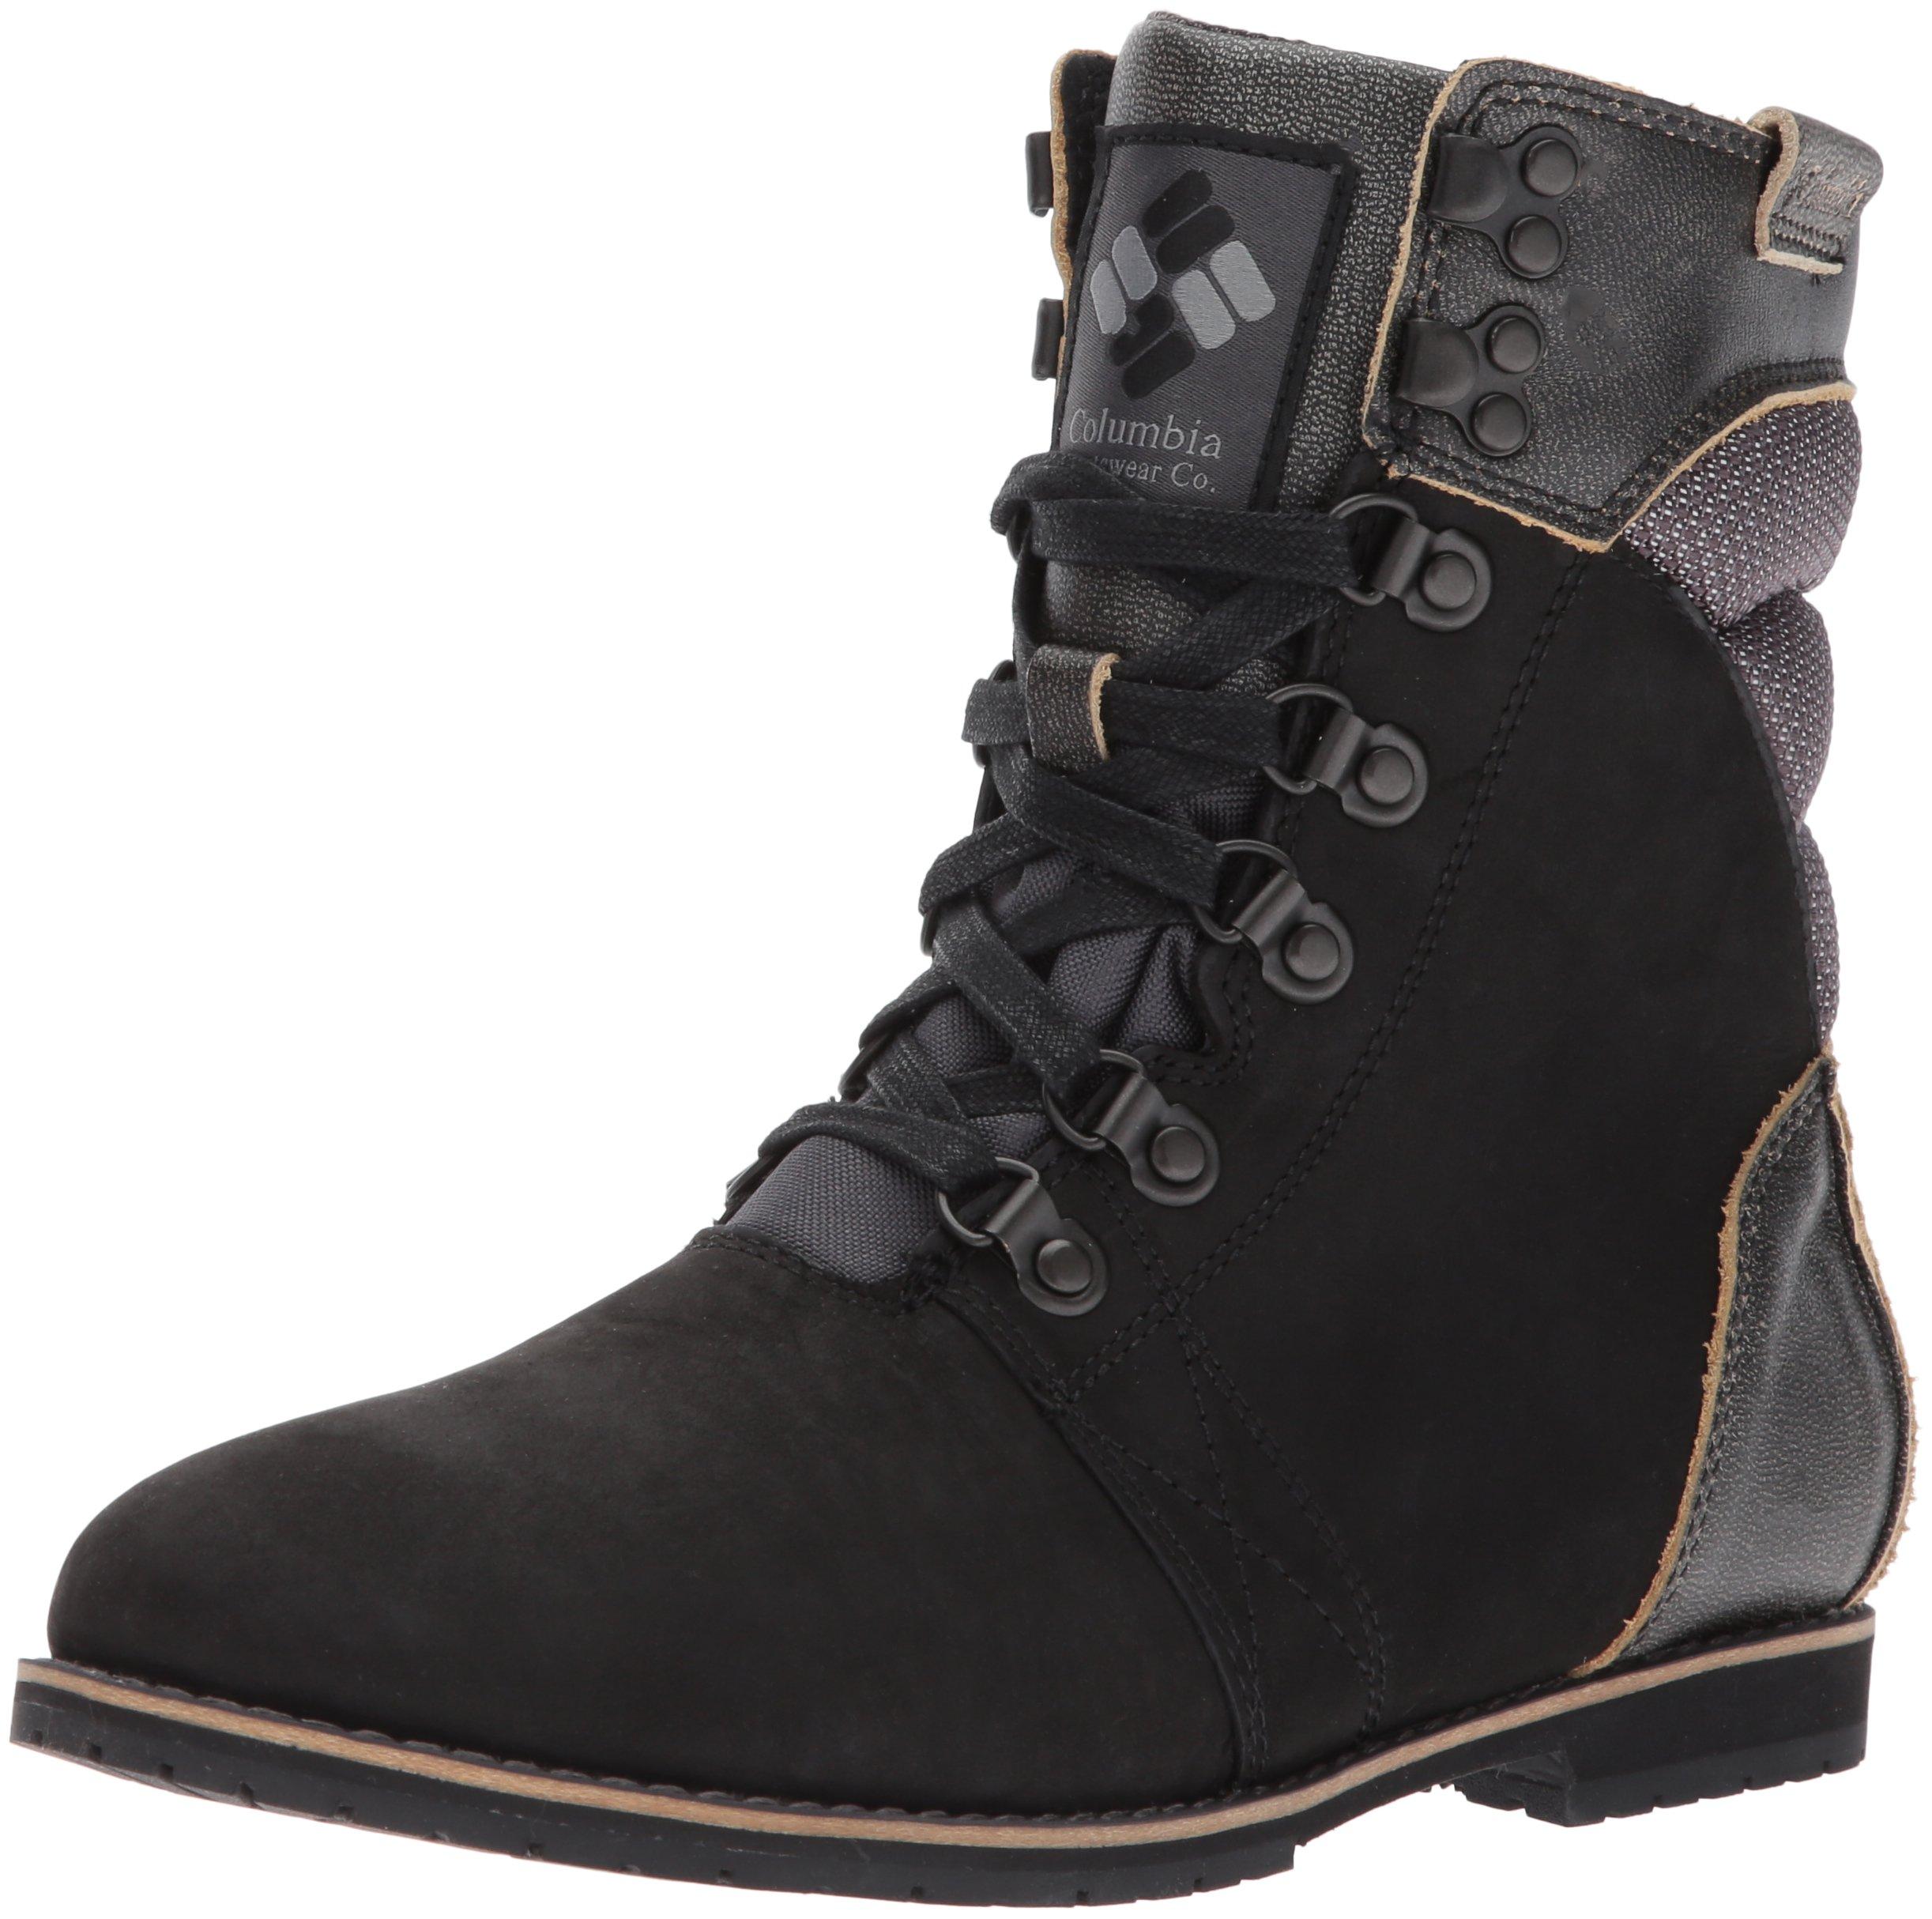 Columbia Women's Twentythird Ave Waterproof Mid Uniform Dress Shoe, Black, Ti Grey Steel, 11 B US